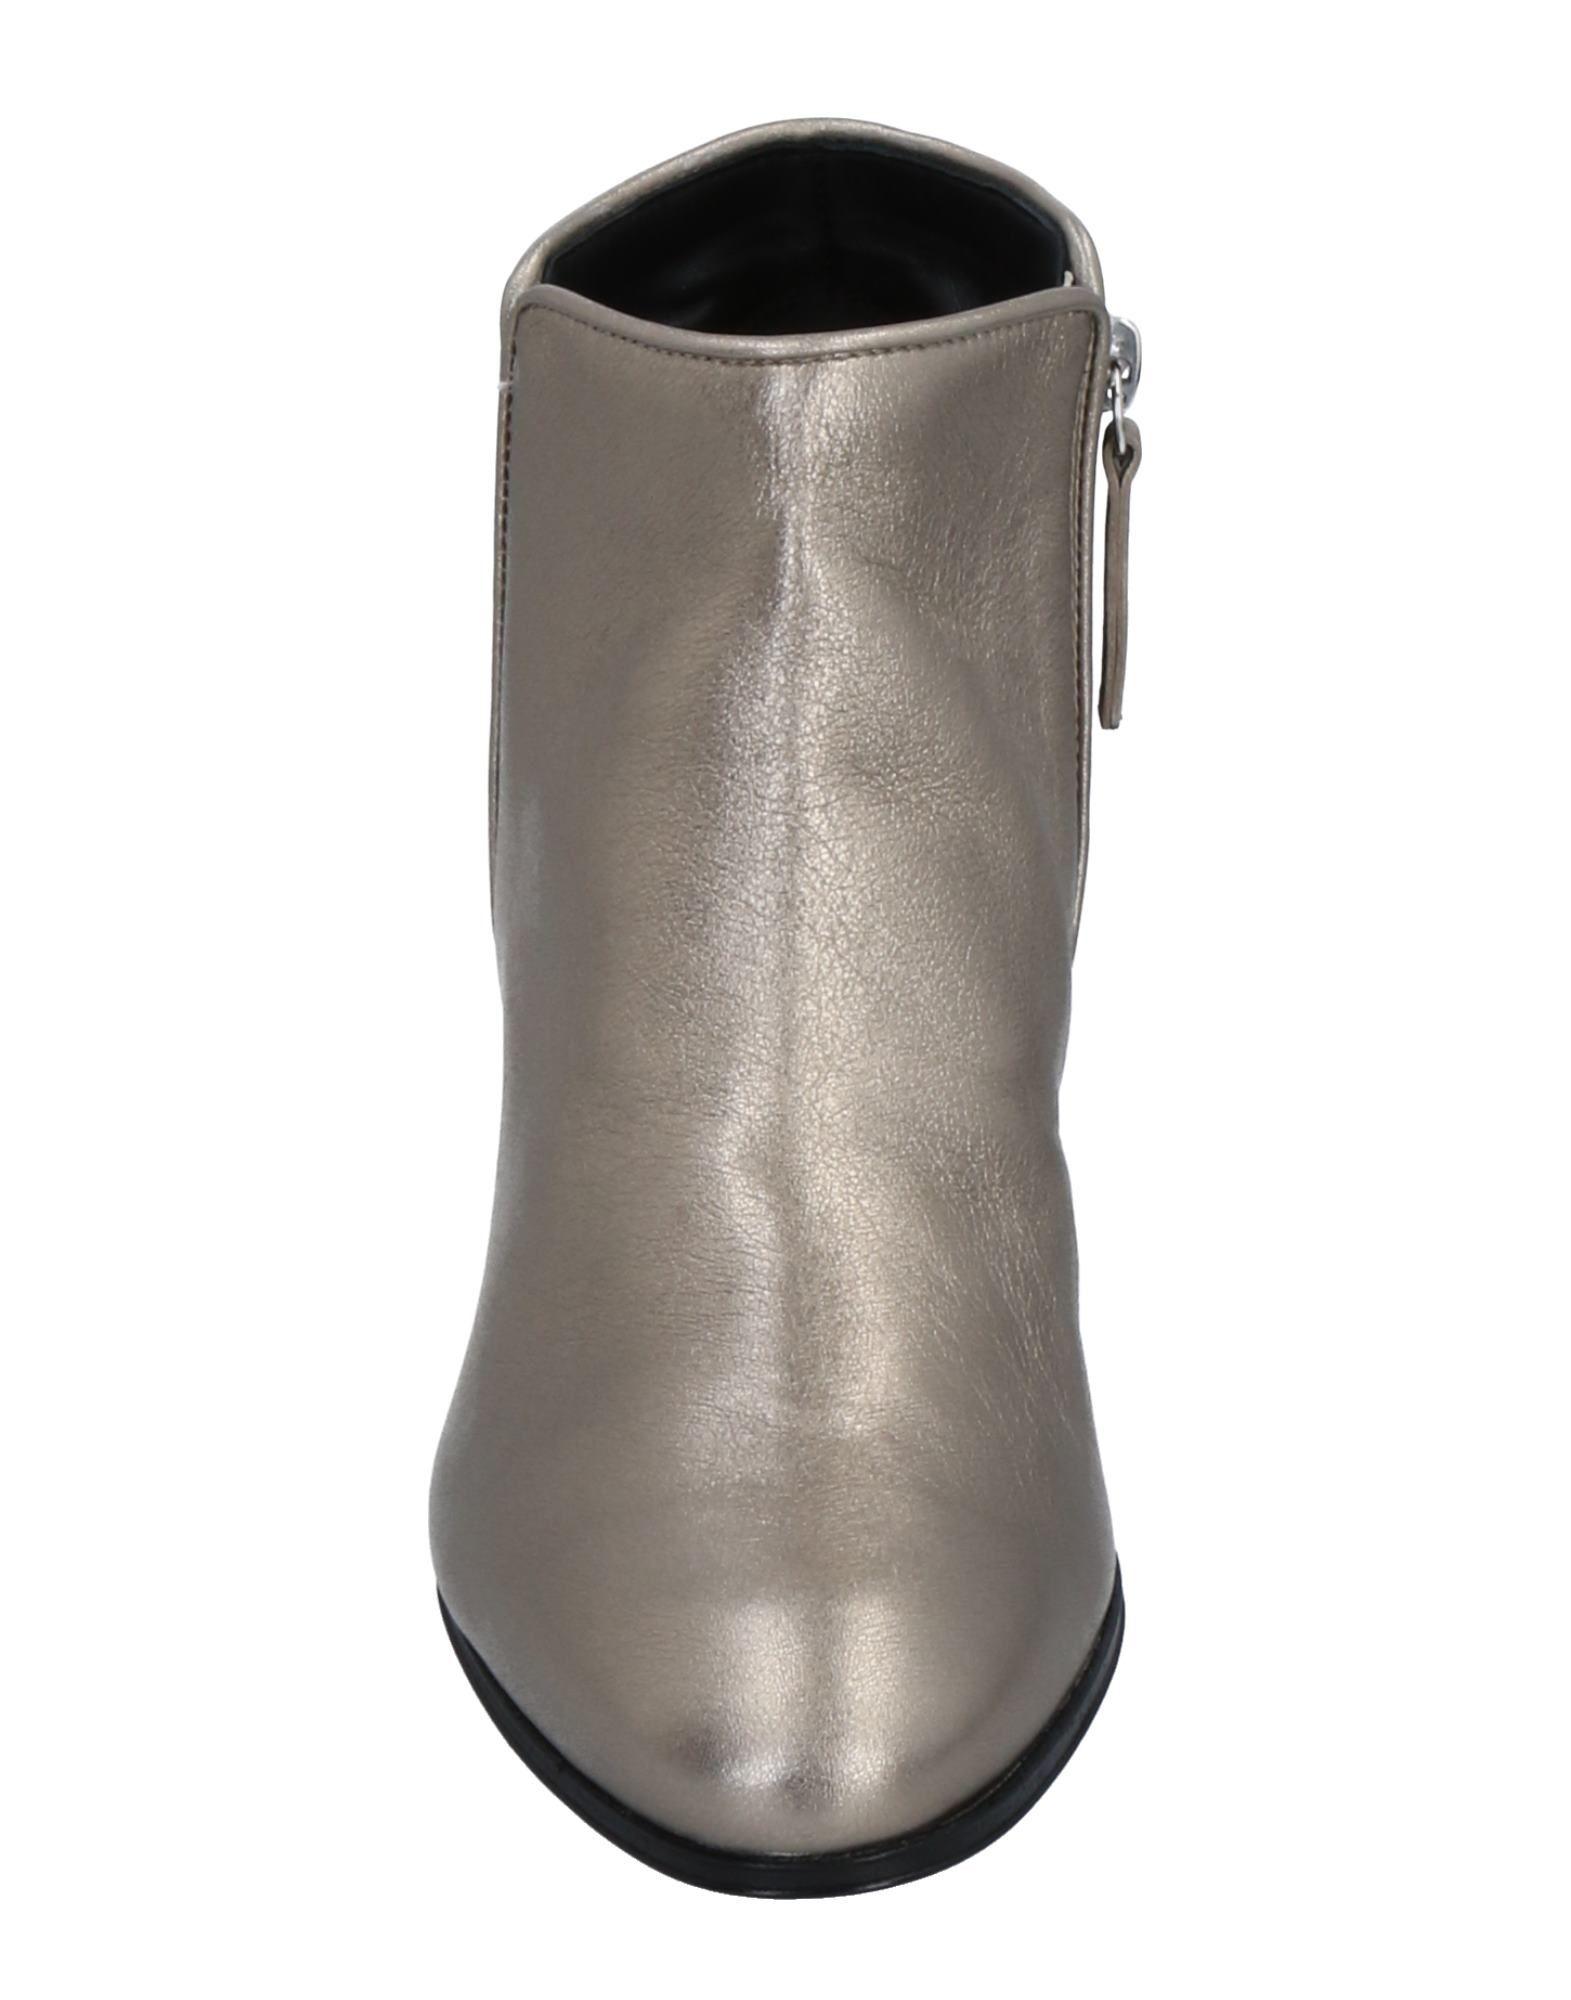 Rabatt Schuhe Giuseppe Zanotti Stiefelette Damen 11515910CF 11515910CF 11515910CF 5d274c